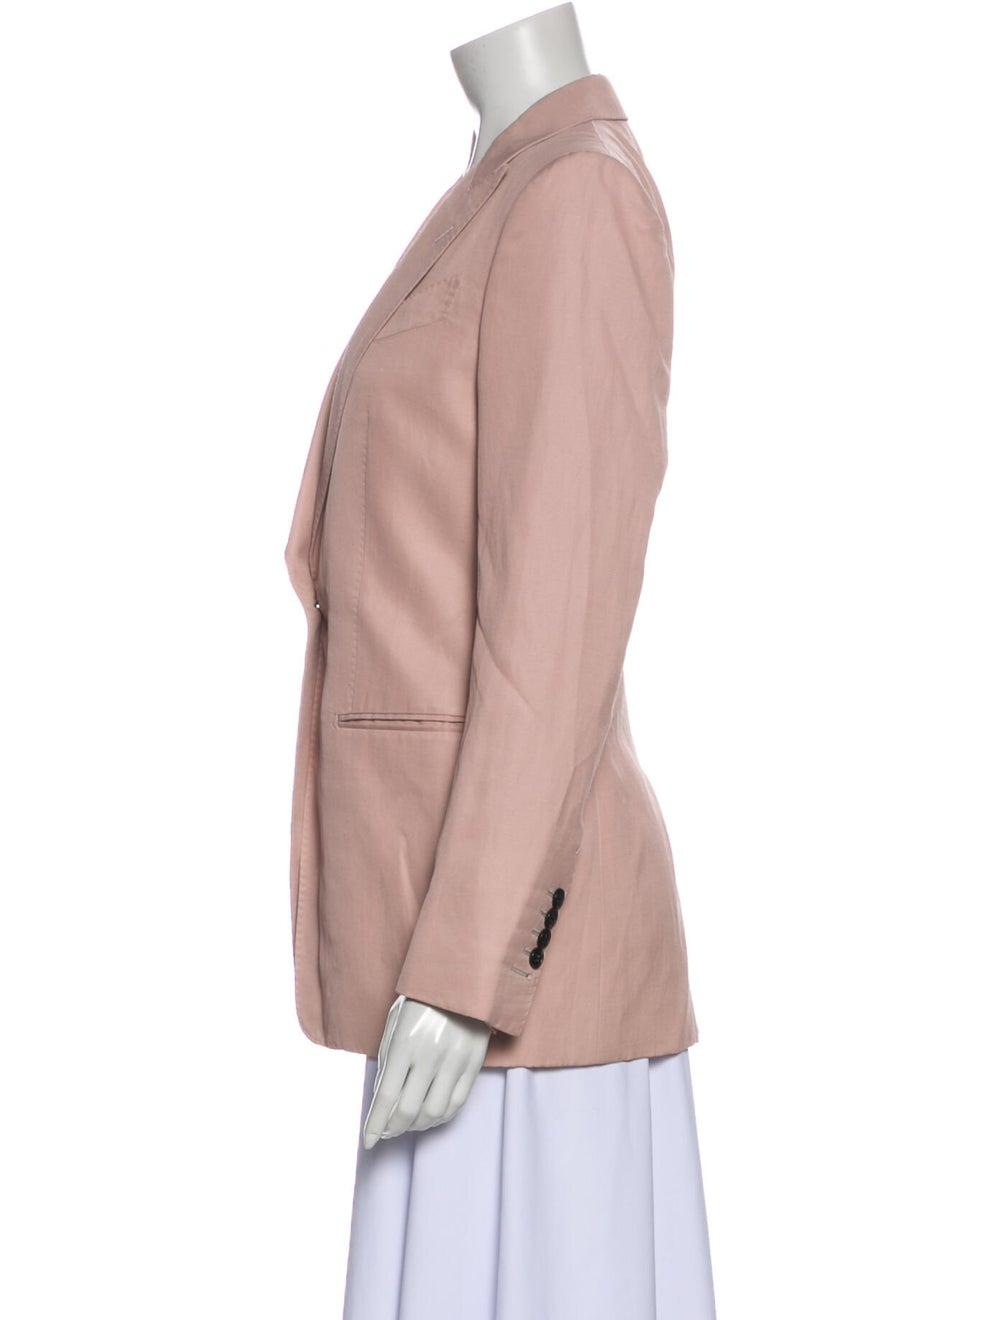 Tom Ford Blazer Pink - image 2